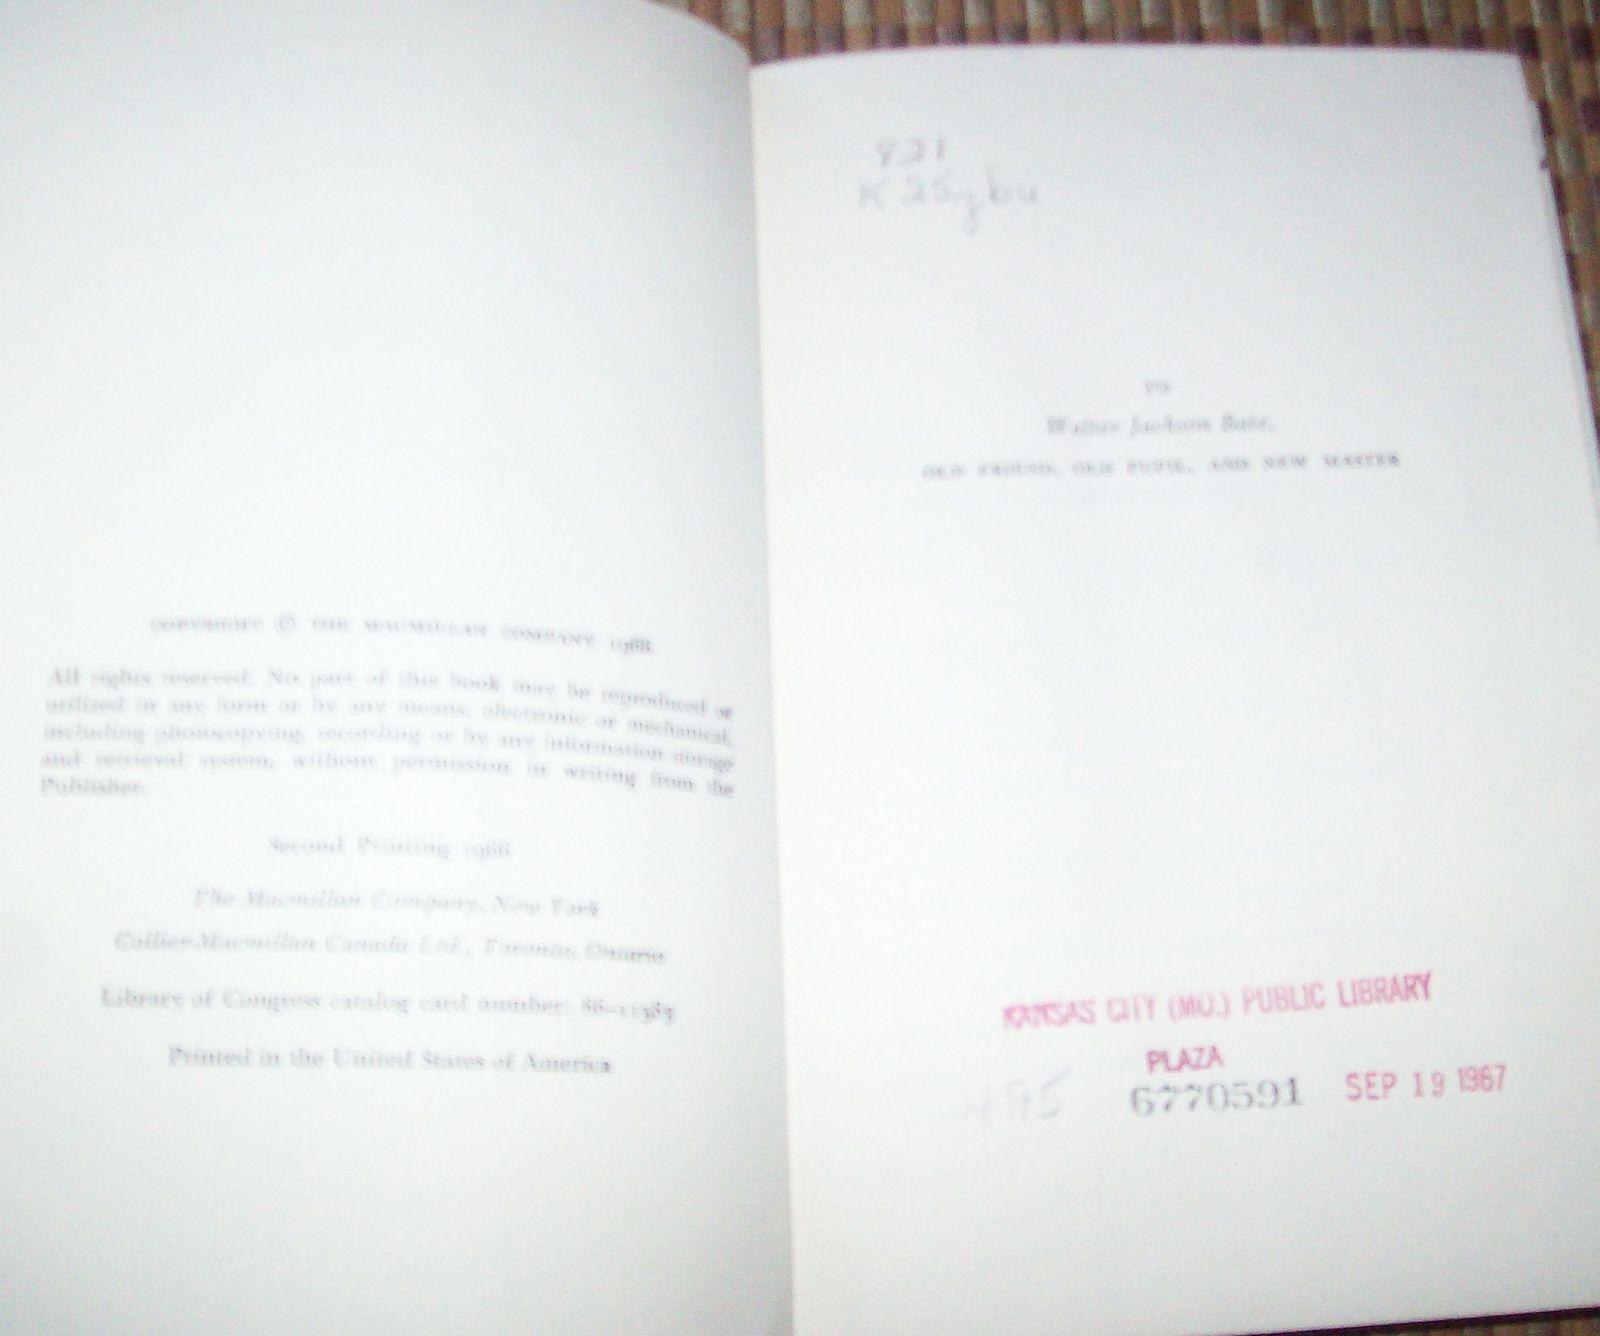 John Keats His Life and Writings by Douglas Bush 1966 HBDJ